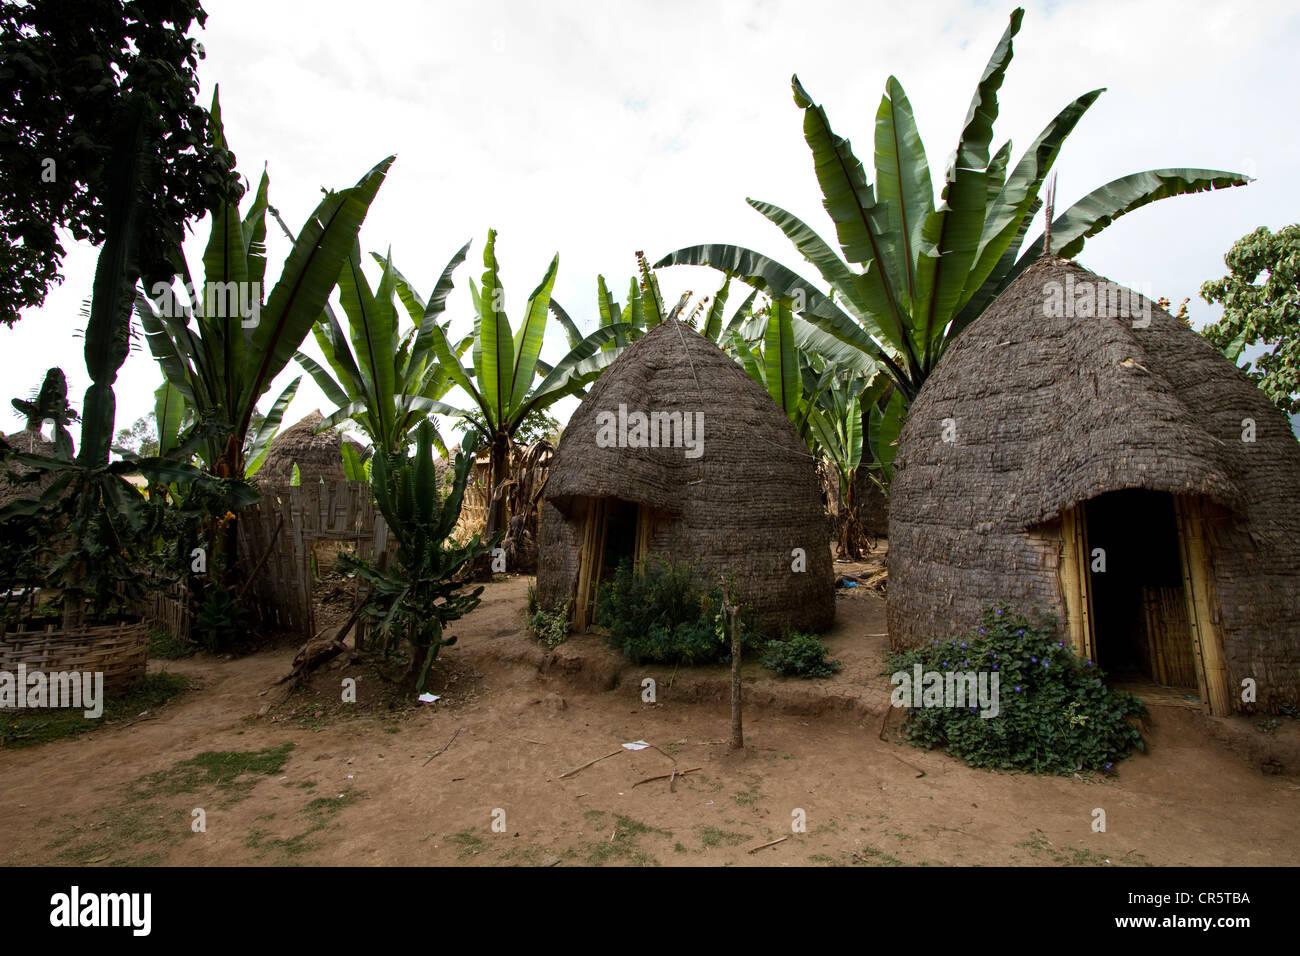 Beehive-shaped huts, Dorze village, near Arba Minch, Omo Valley, South Ethiopia, Africa Stock Photo